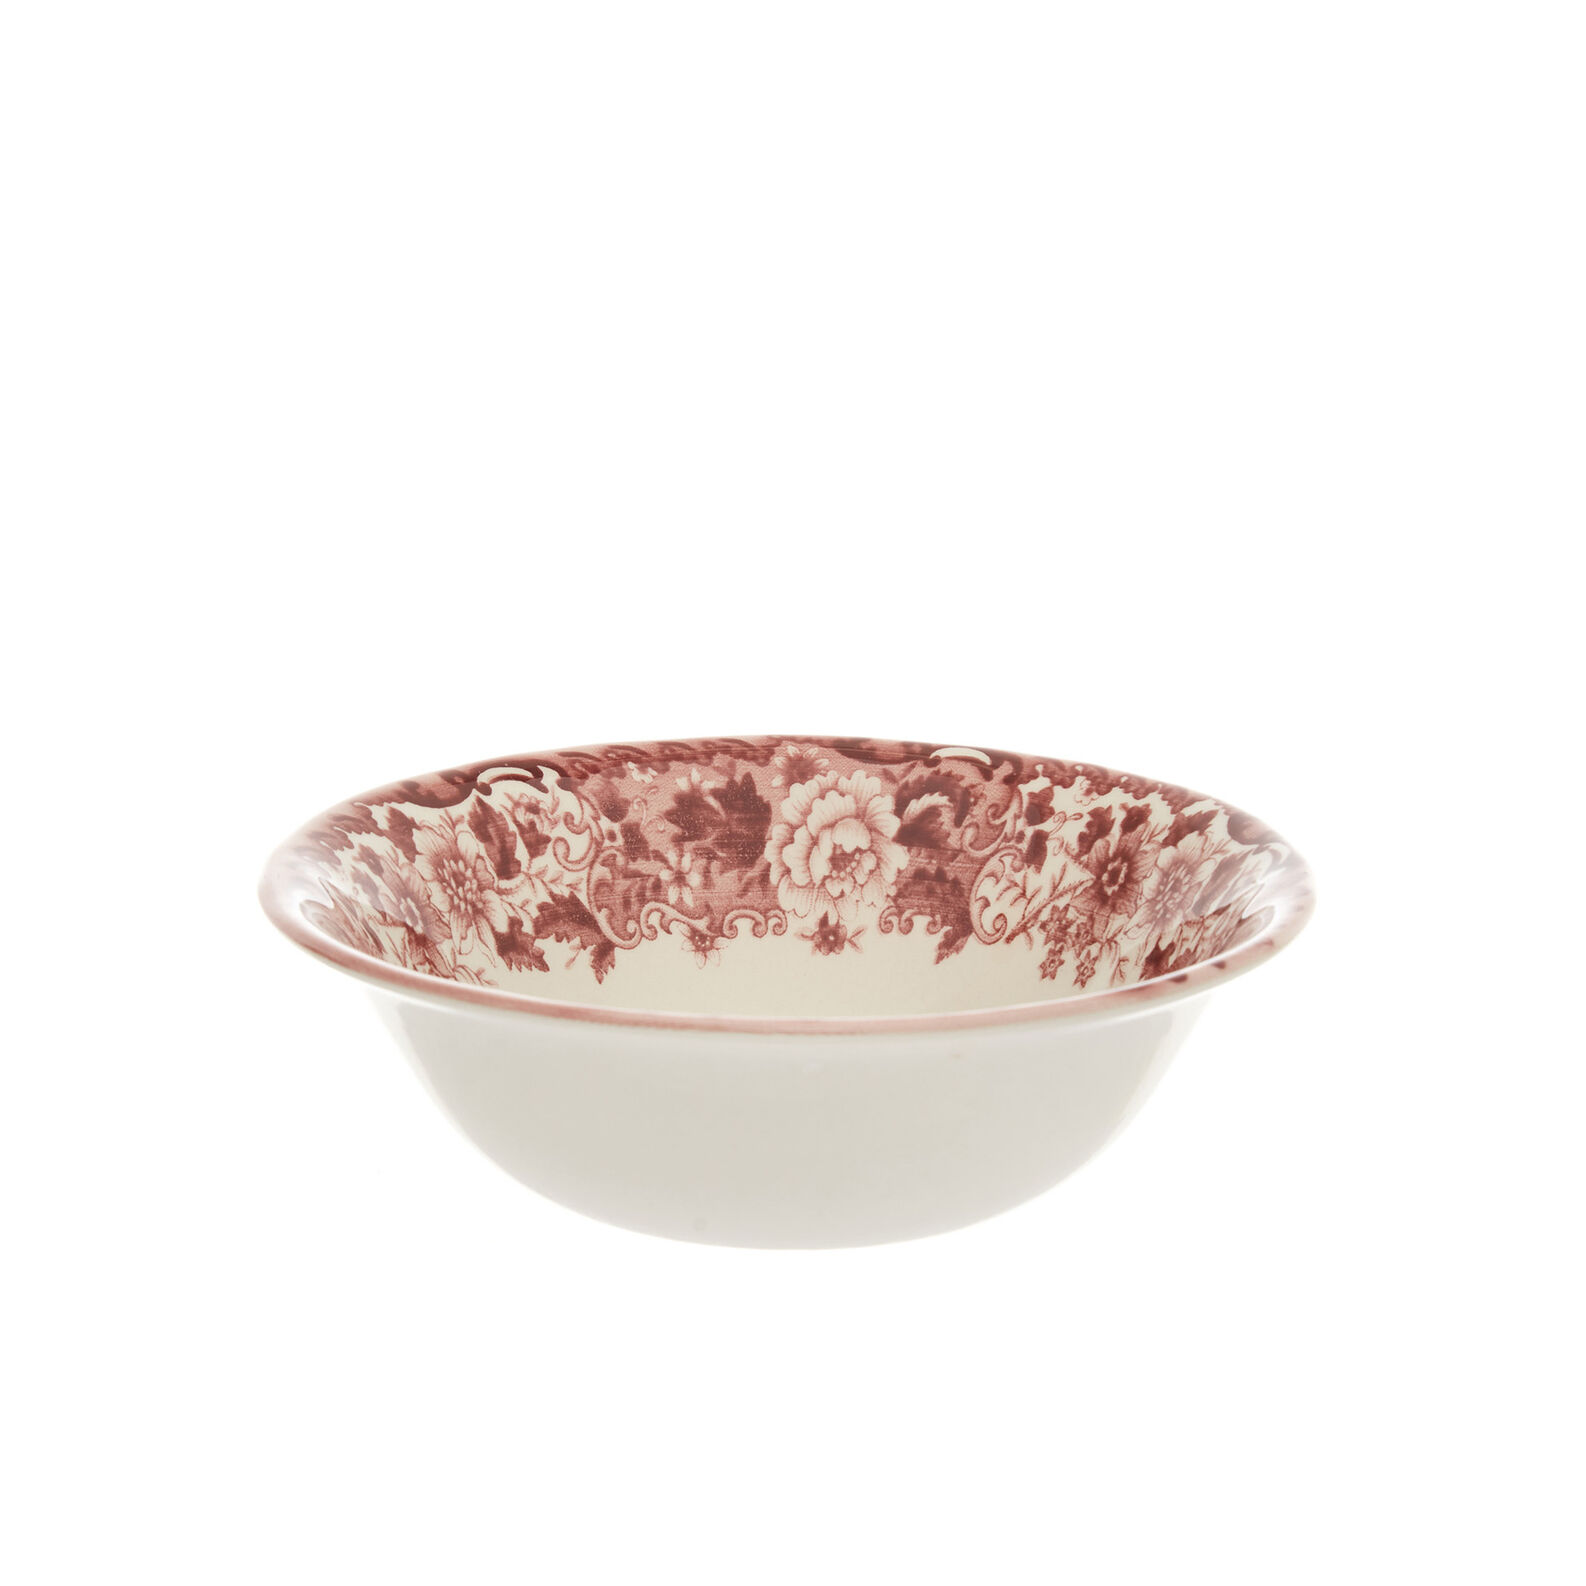 Belmont small ceramic bowl